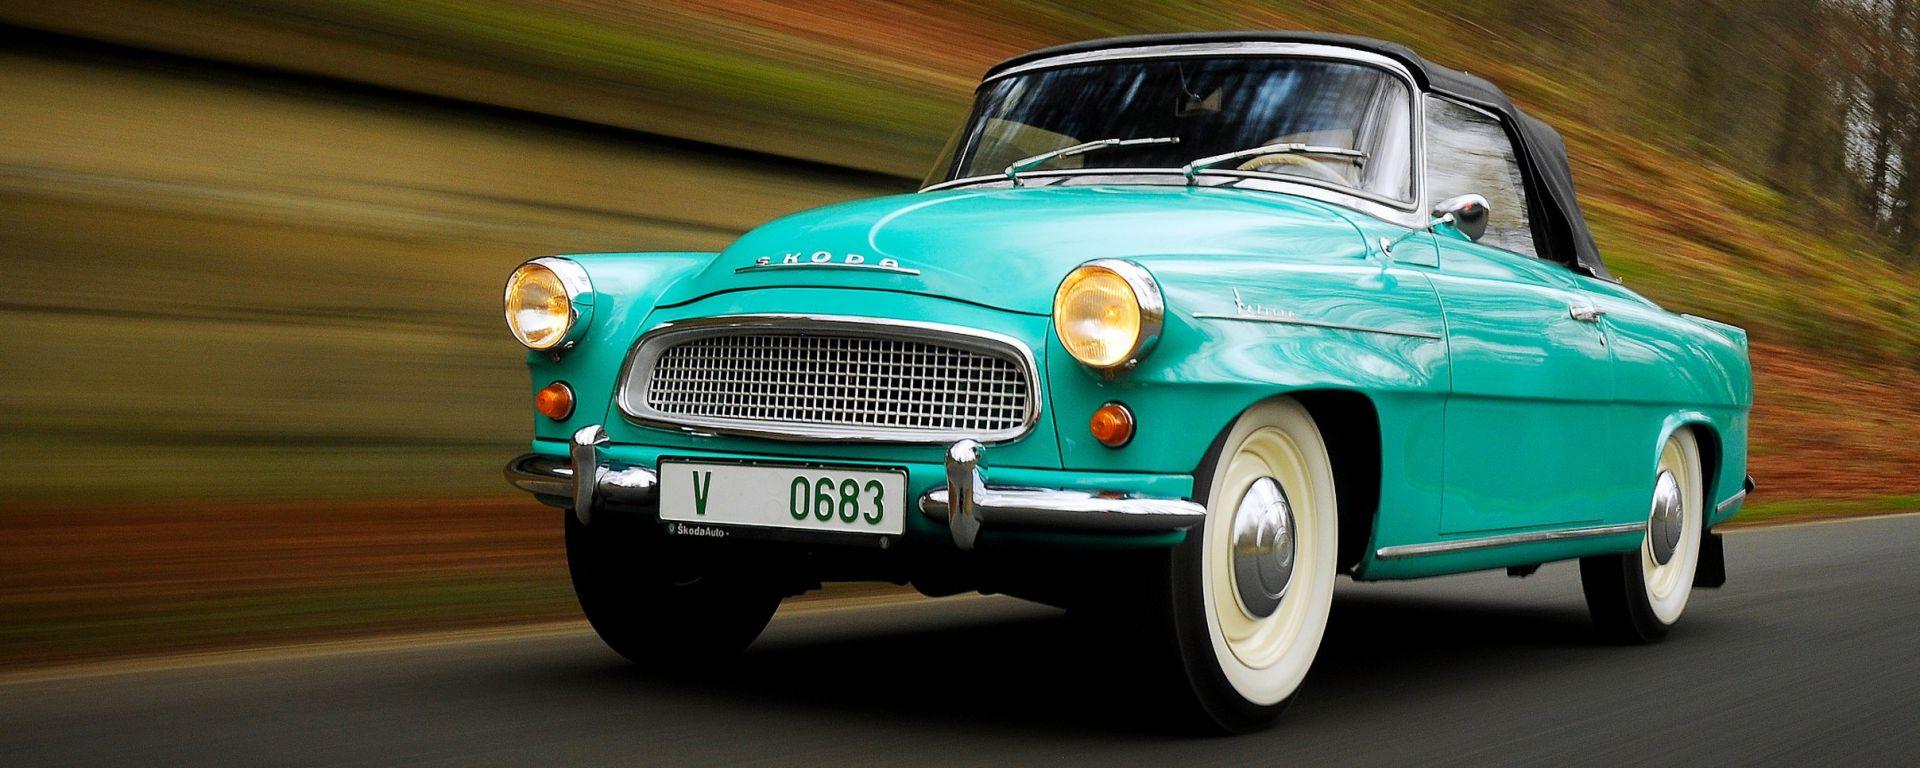 Škoda Vintage: Octavia, Felicia e gli Anni 50